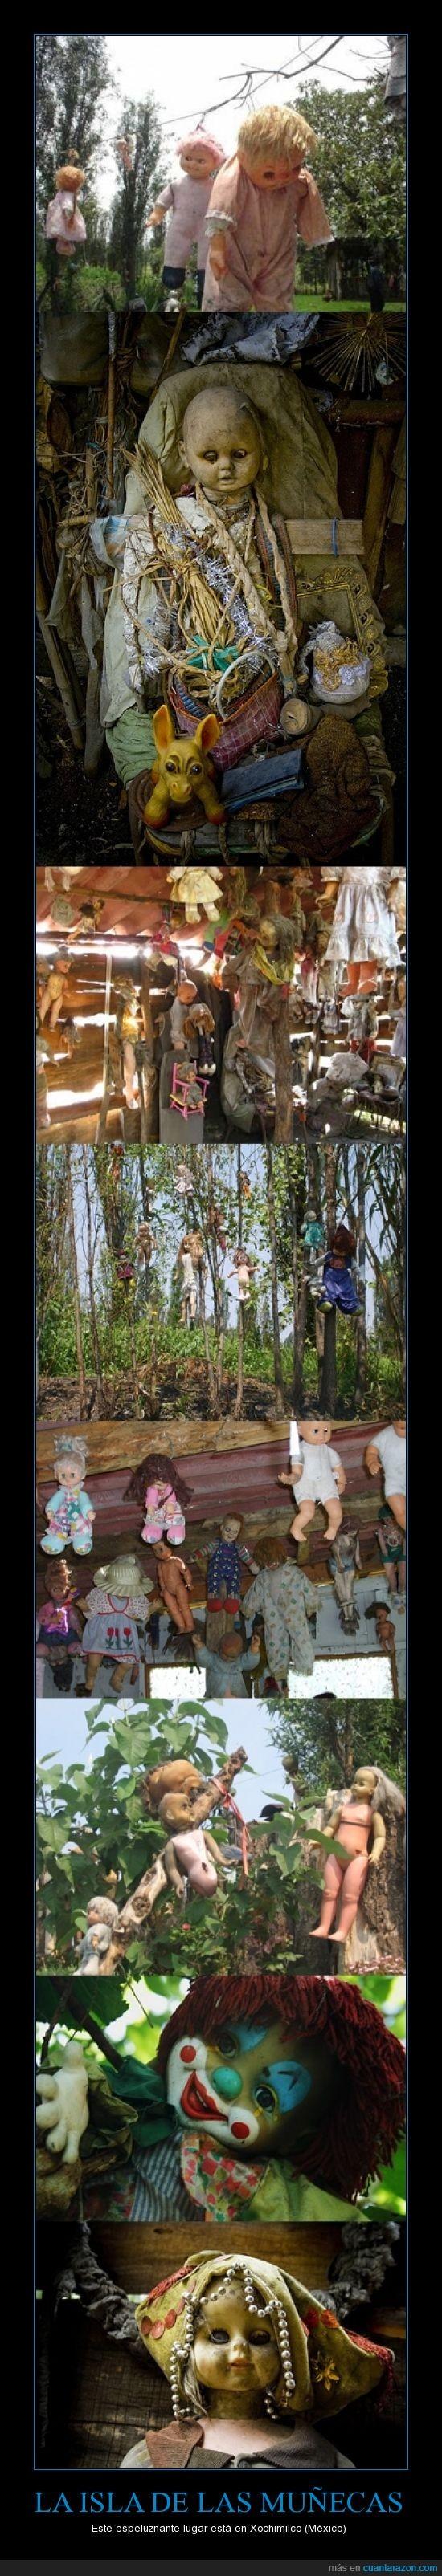 isla,mal rollito,México,miedo,muñecas,Xochimilco,yuyu